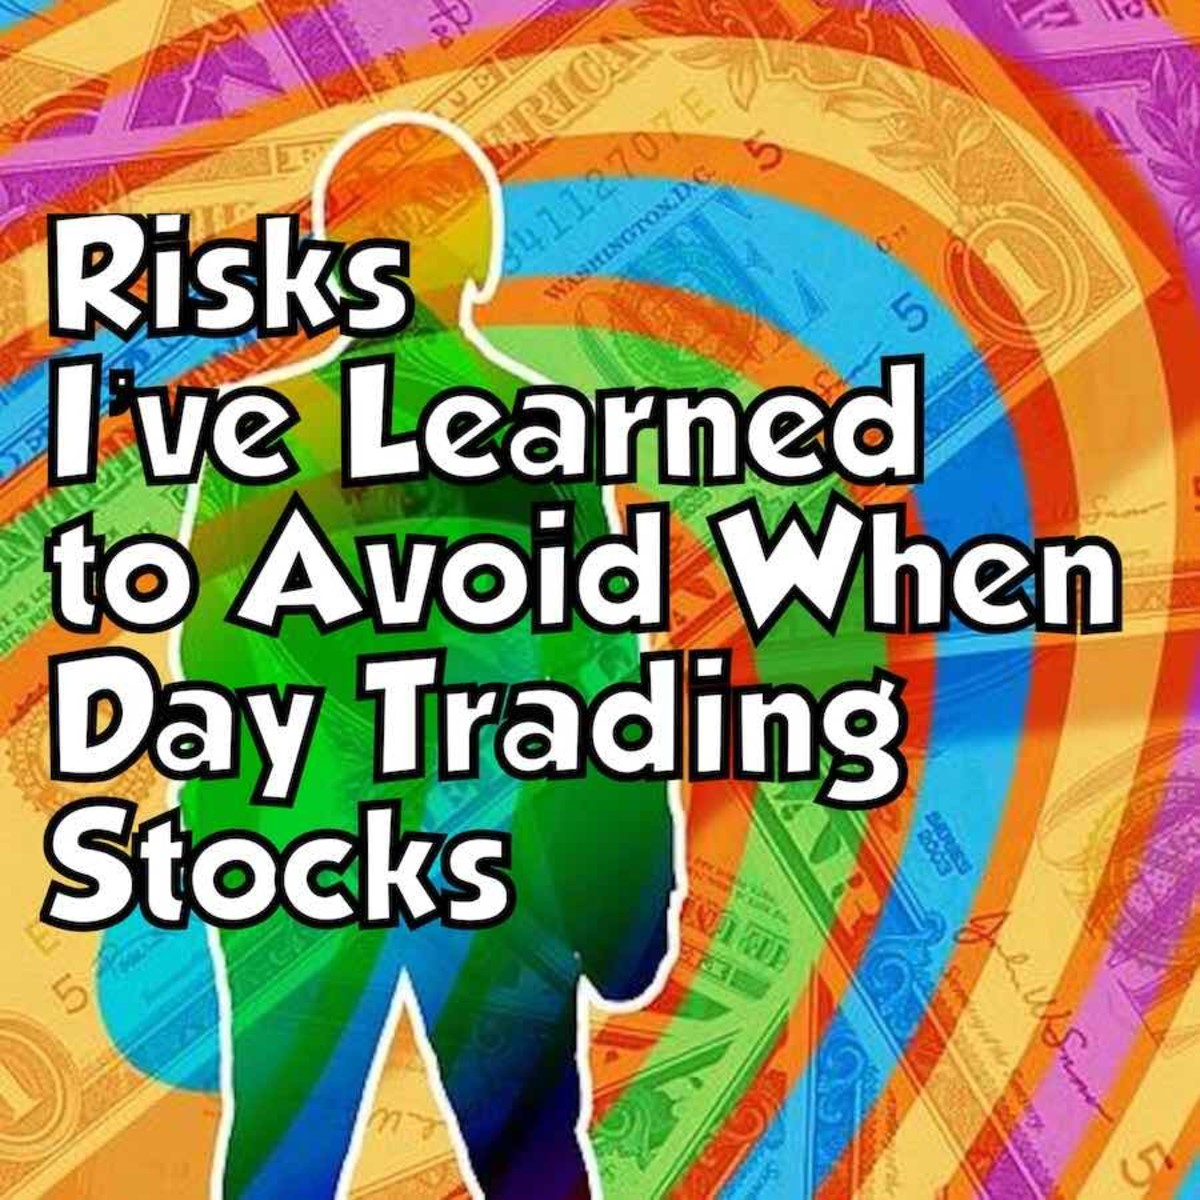 Risks I've Learned to Avoid When Day Trading Stocks